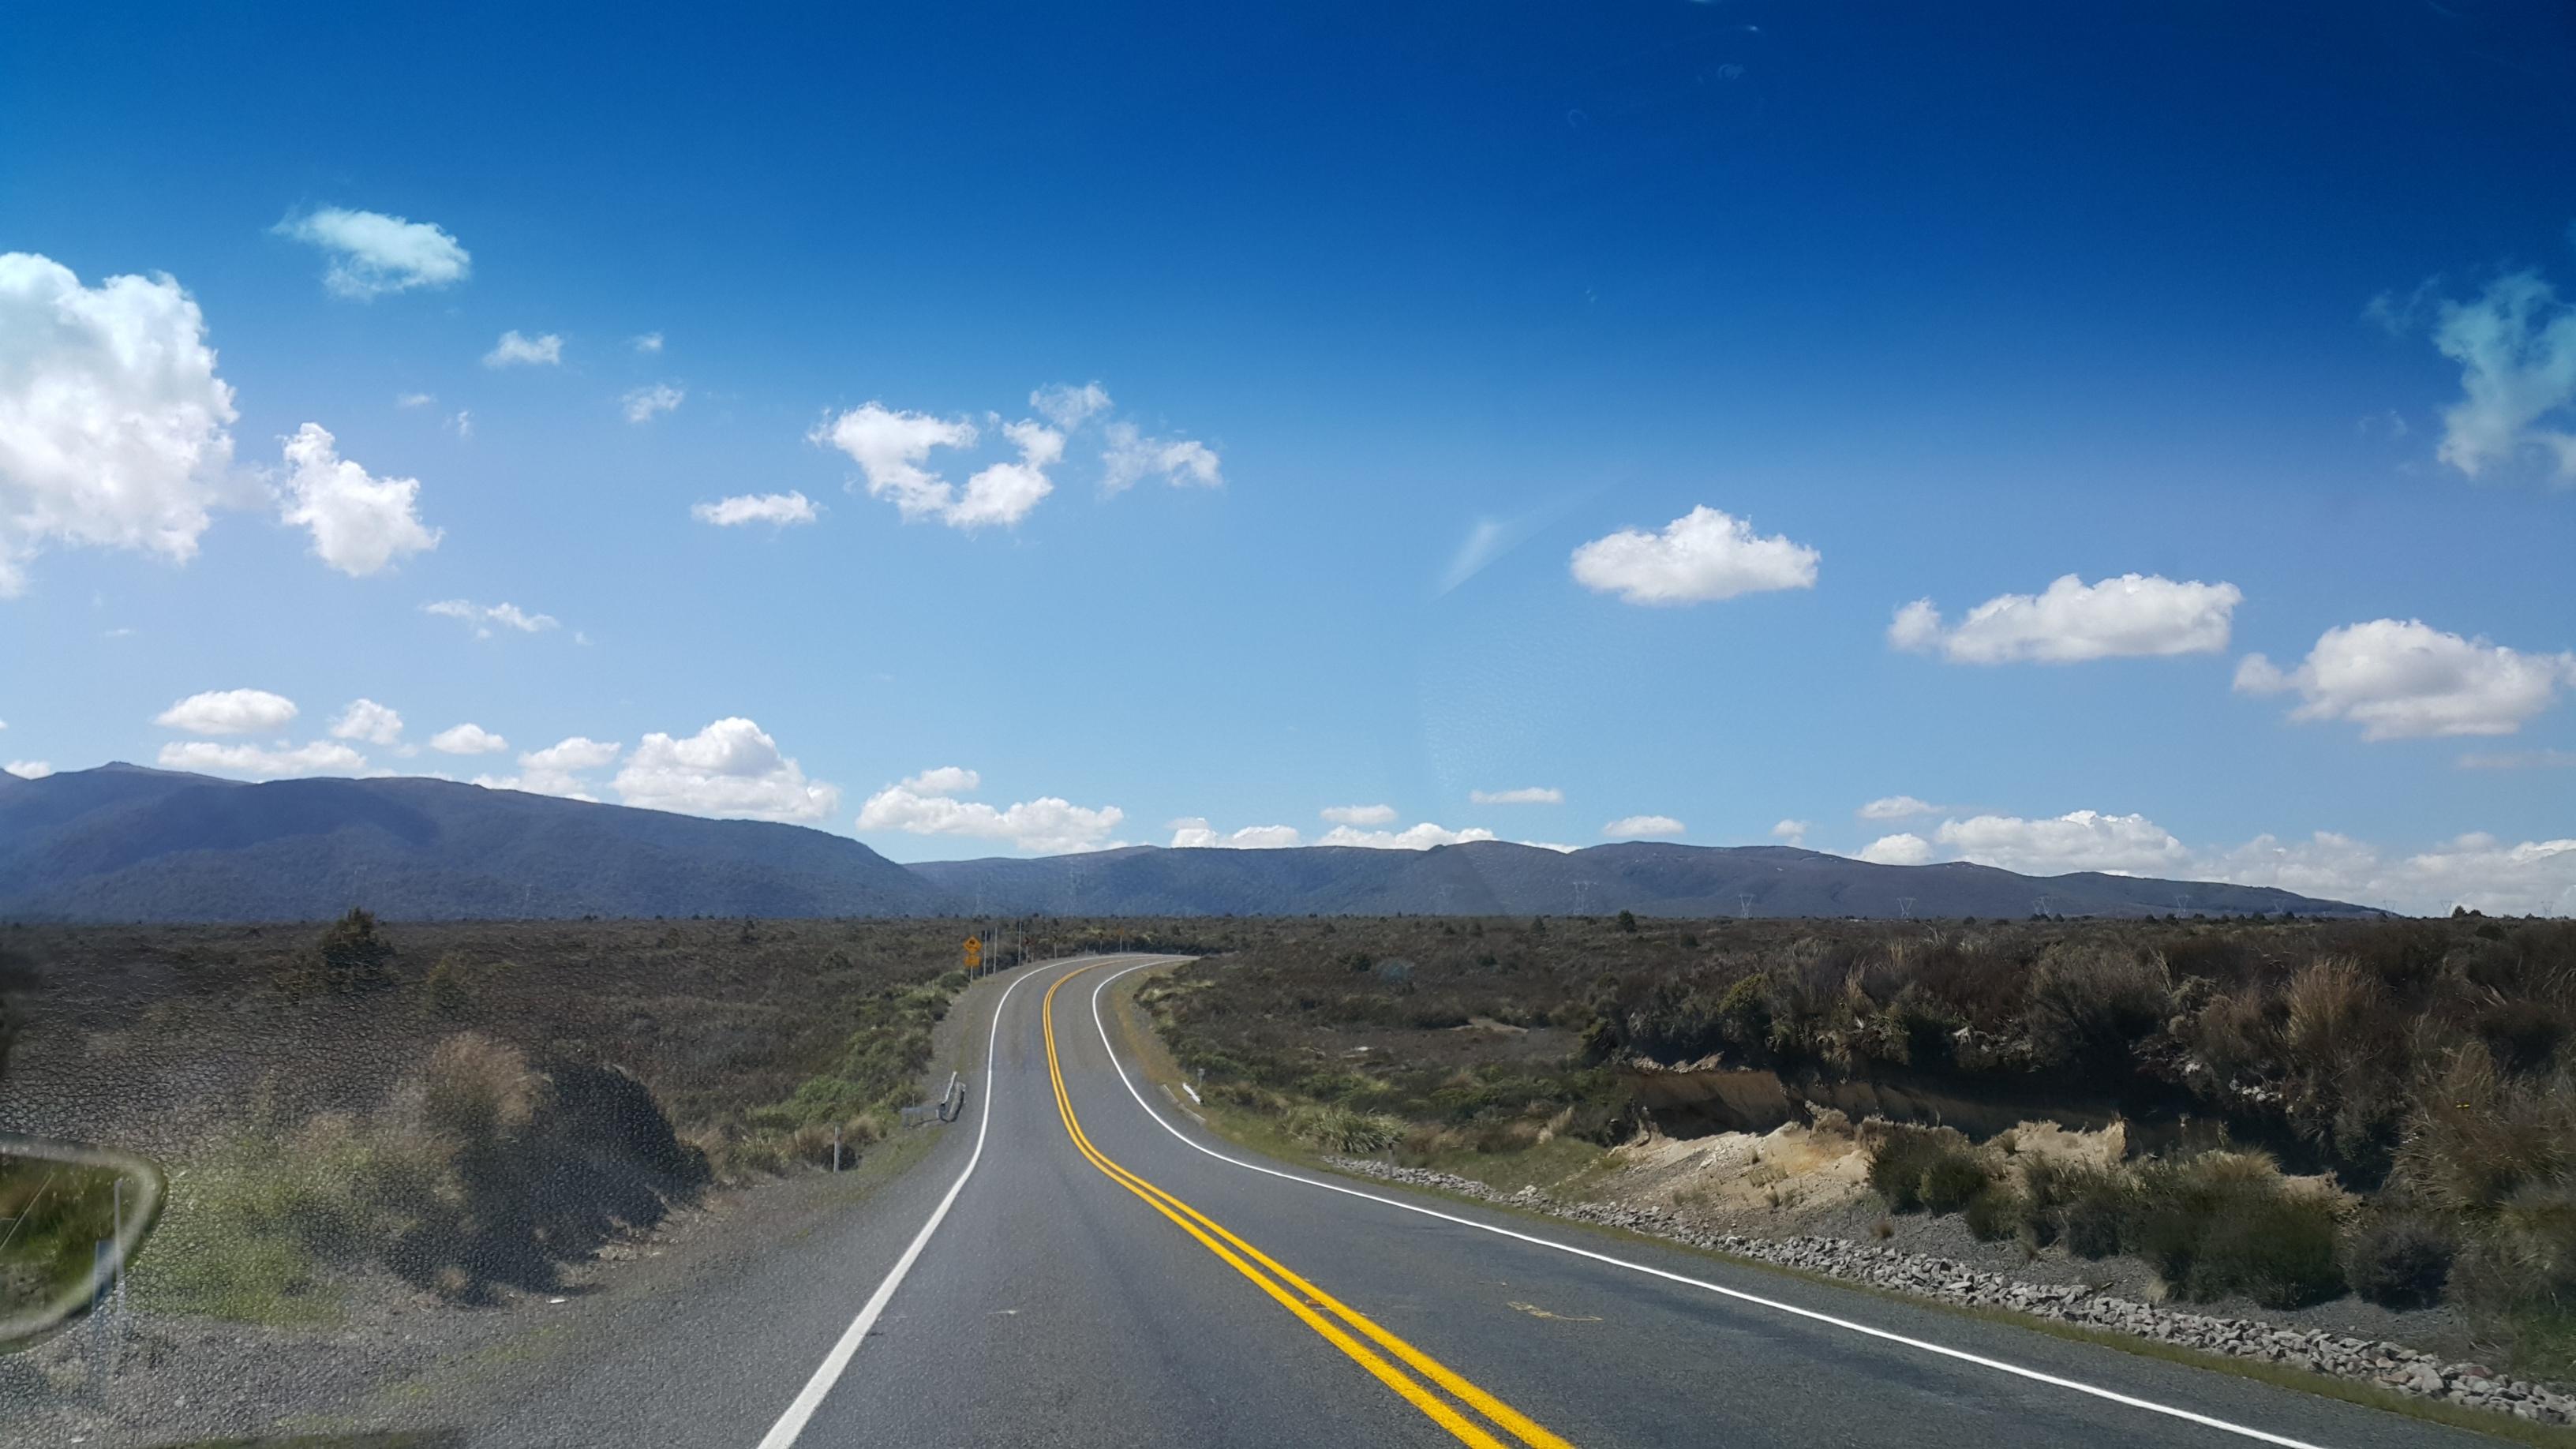 desertroad3.jpg